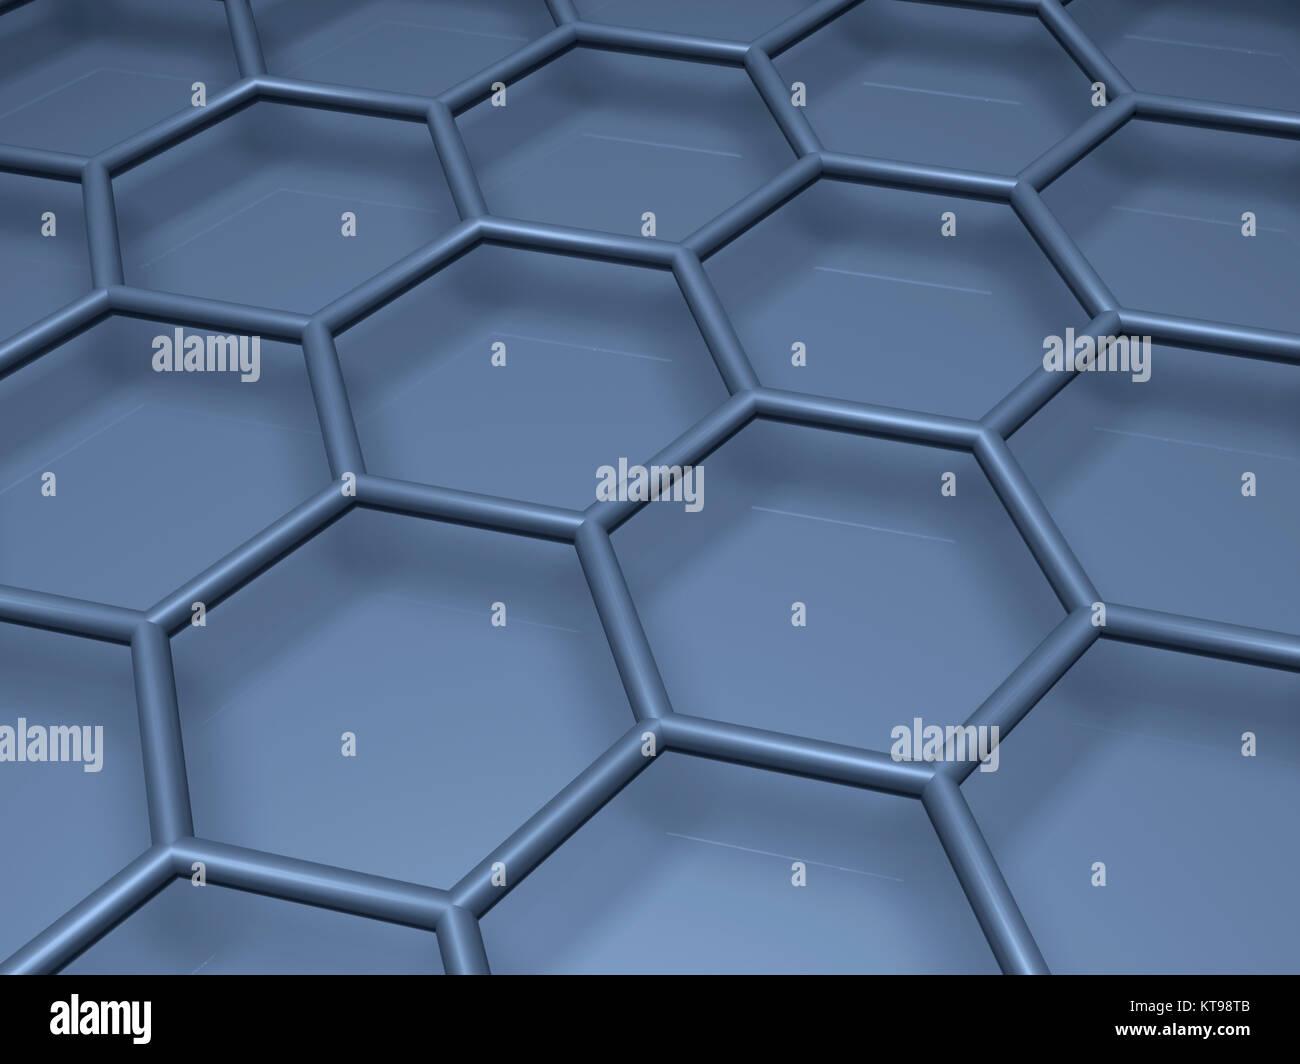 Blue hexagonal lattice fragment, 3d illustration Stock Photo